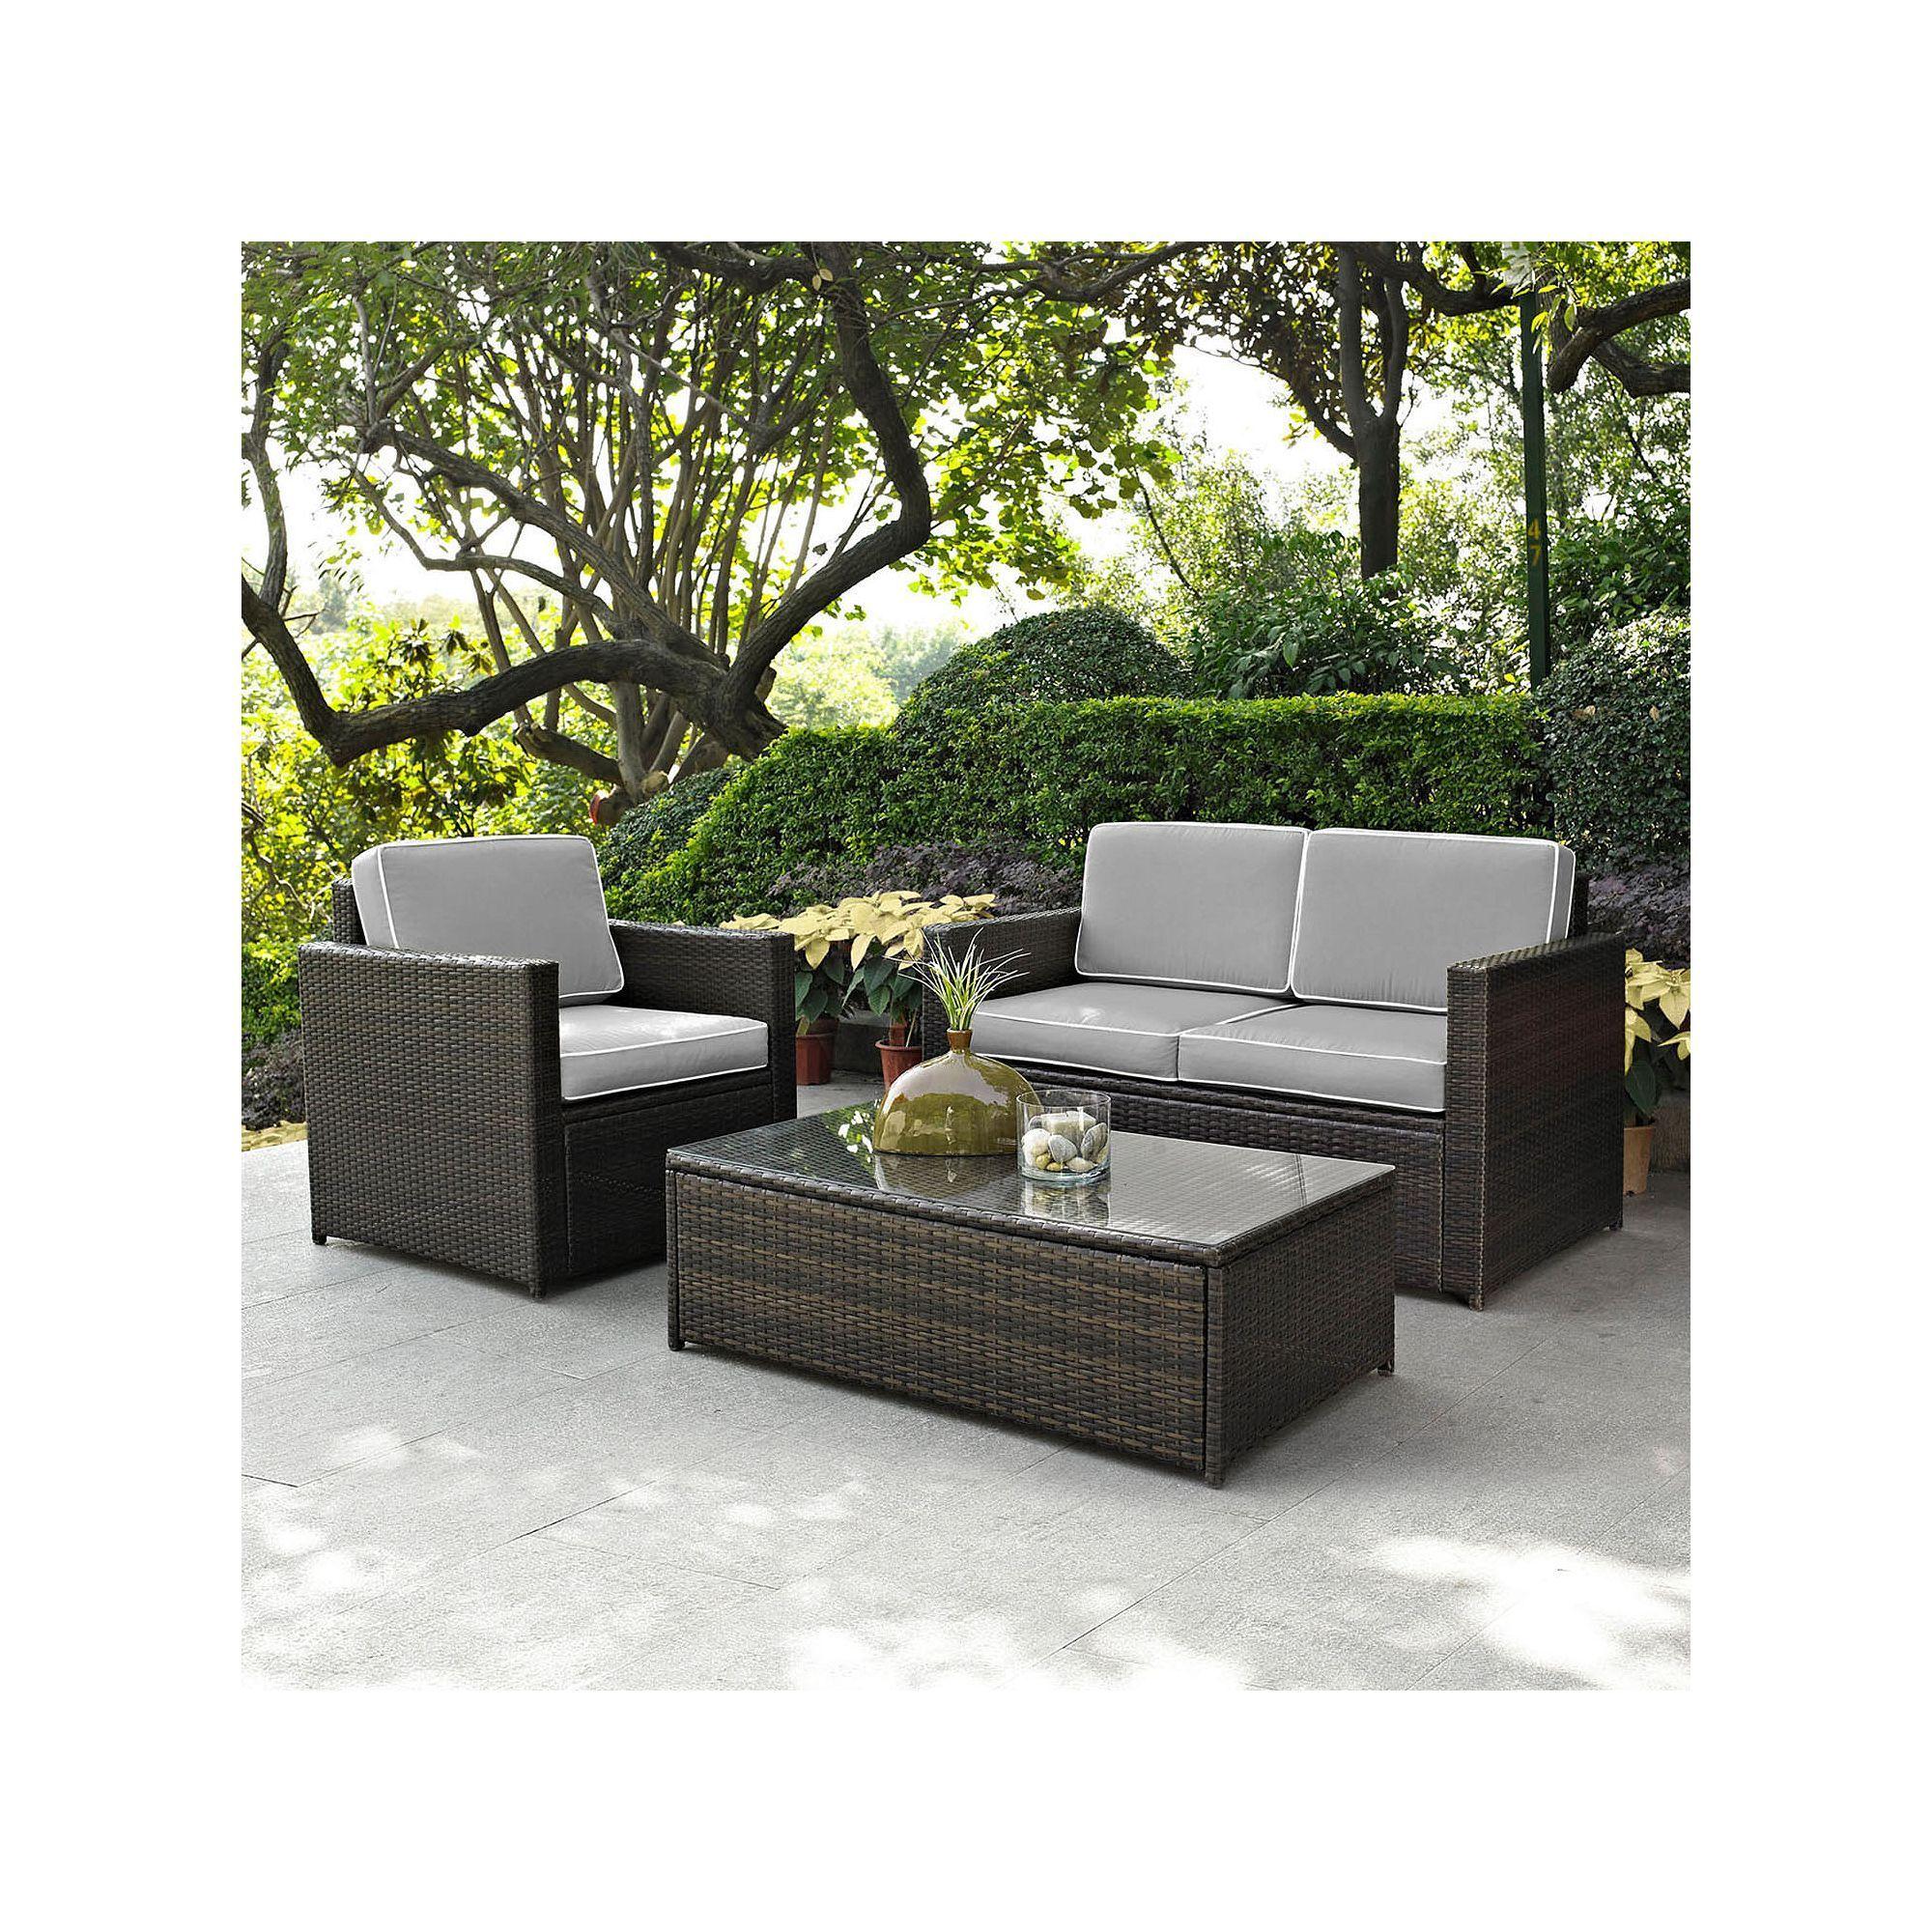 Crosley Furniture Outdoor Palm Harbor Patio Loveseat